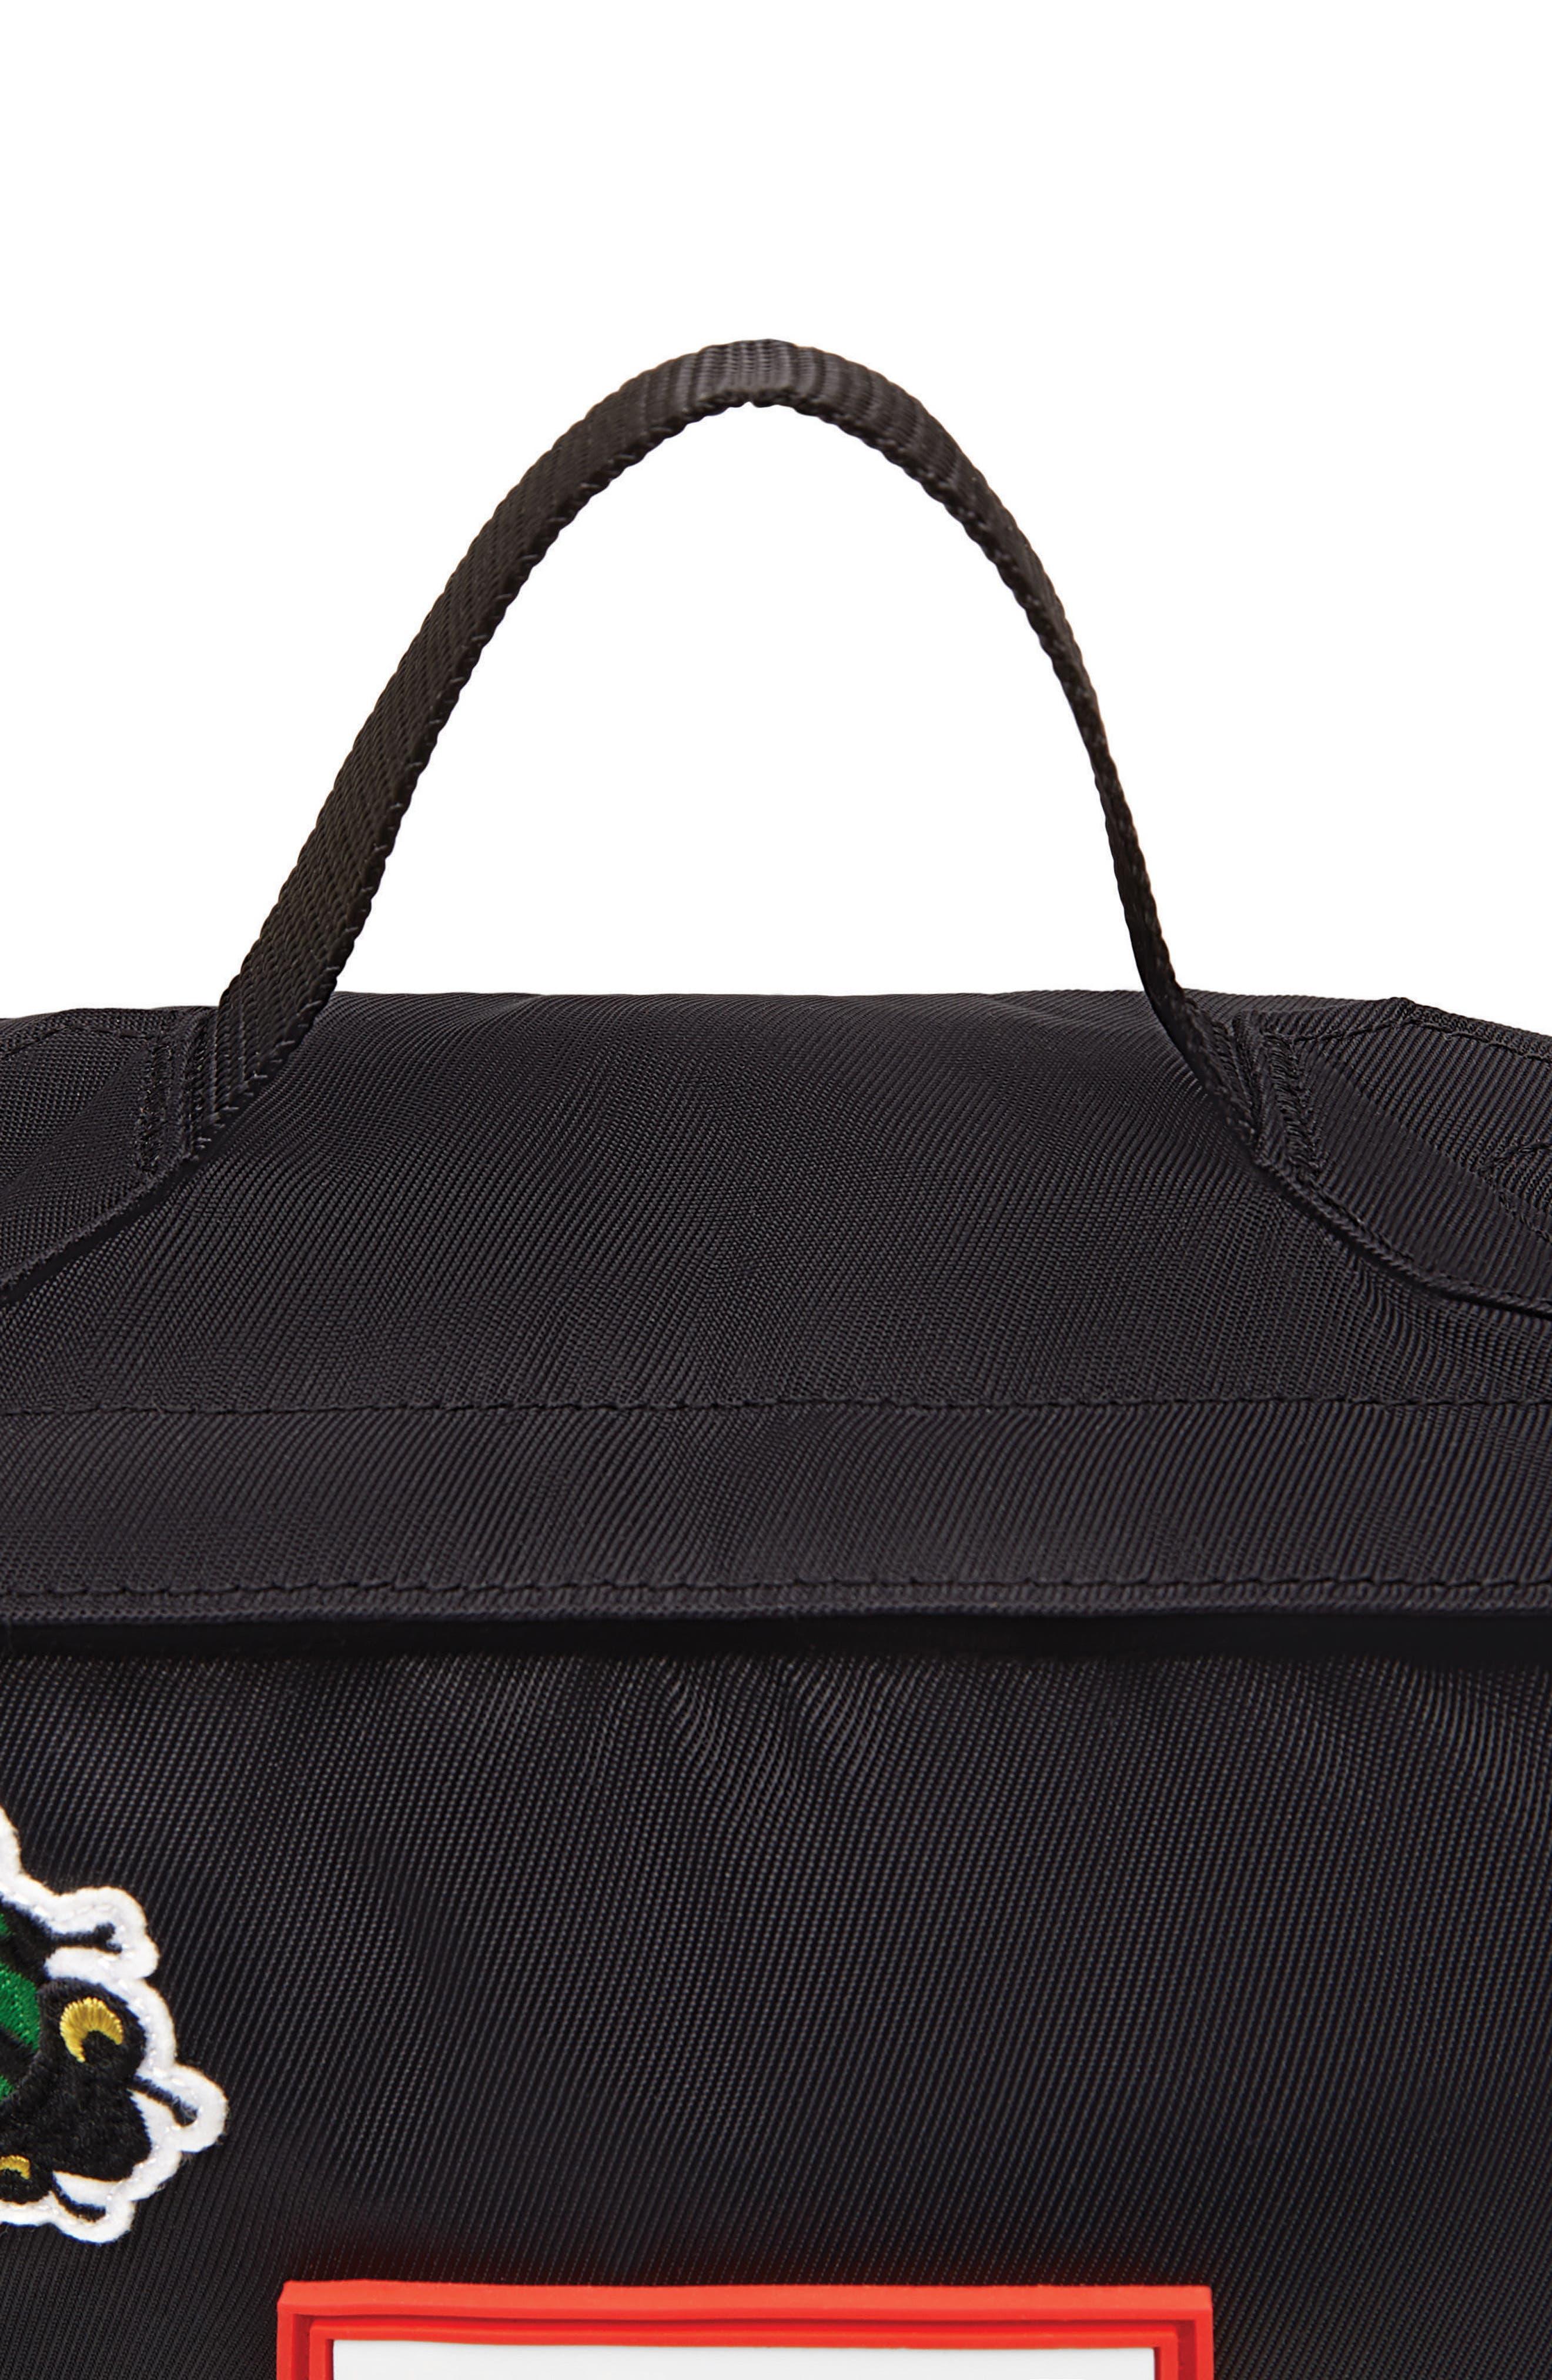 Original Ladybug Water Resistant Backpack,                             Alternate thumbnail 2, color,                             Ladybird Print